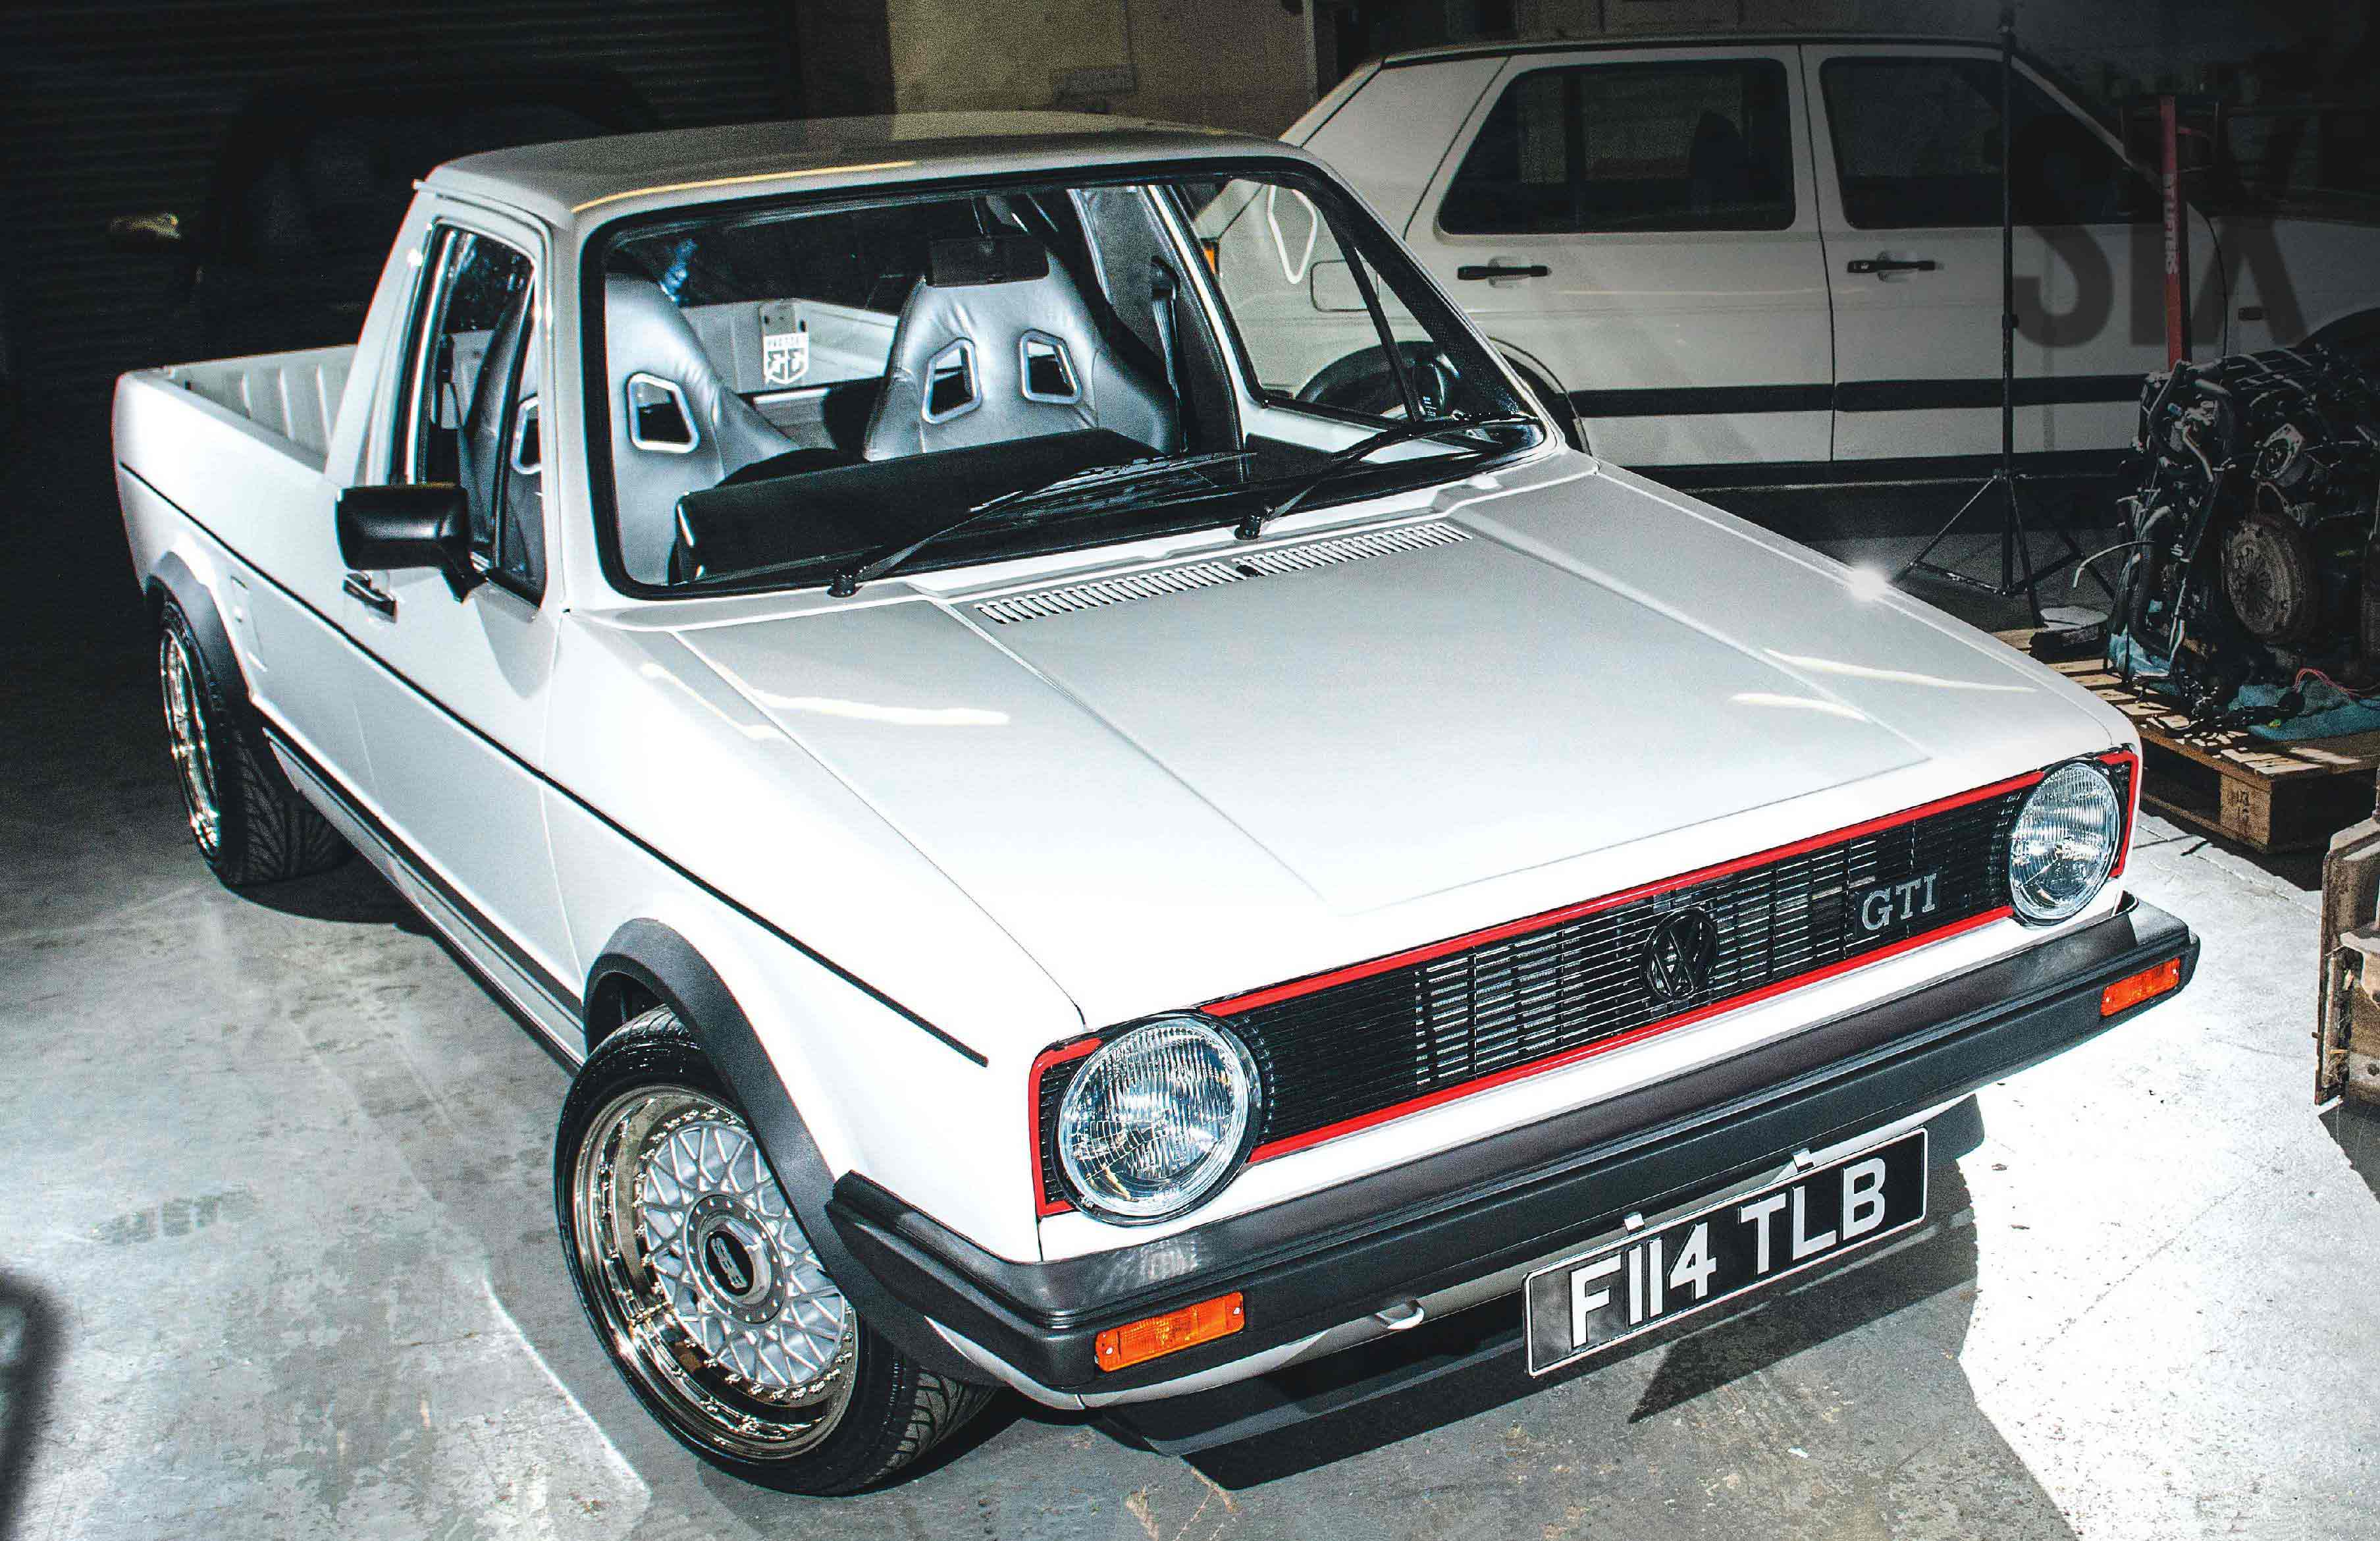 VR6-powered Volkswagen Caddy Mk1 - Drive-My Blogs - Drive